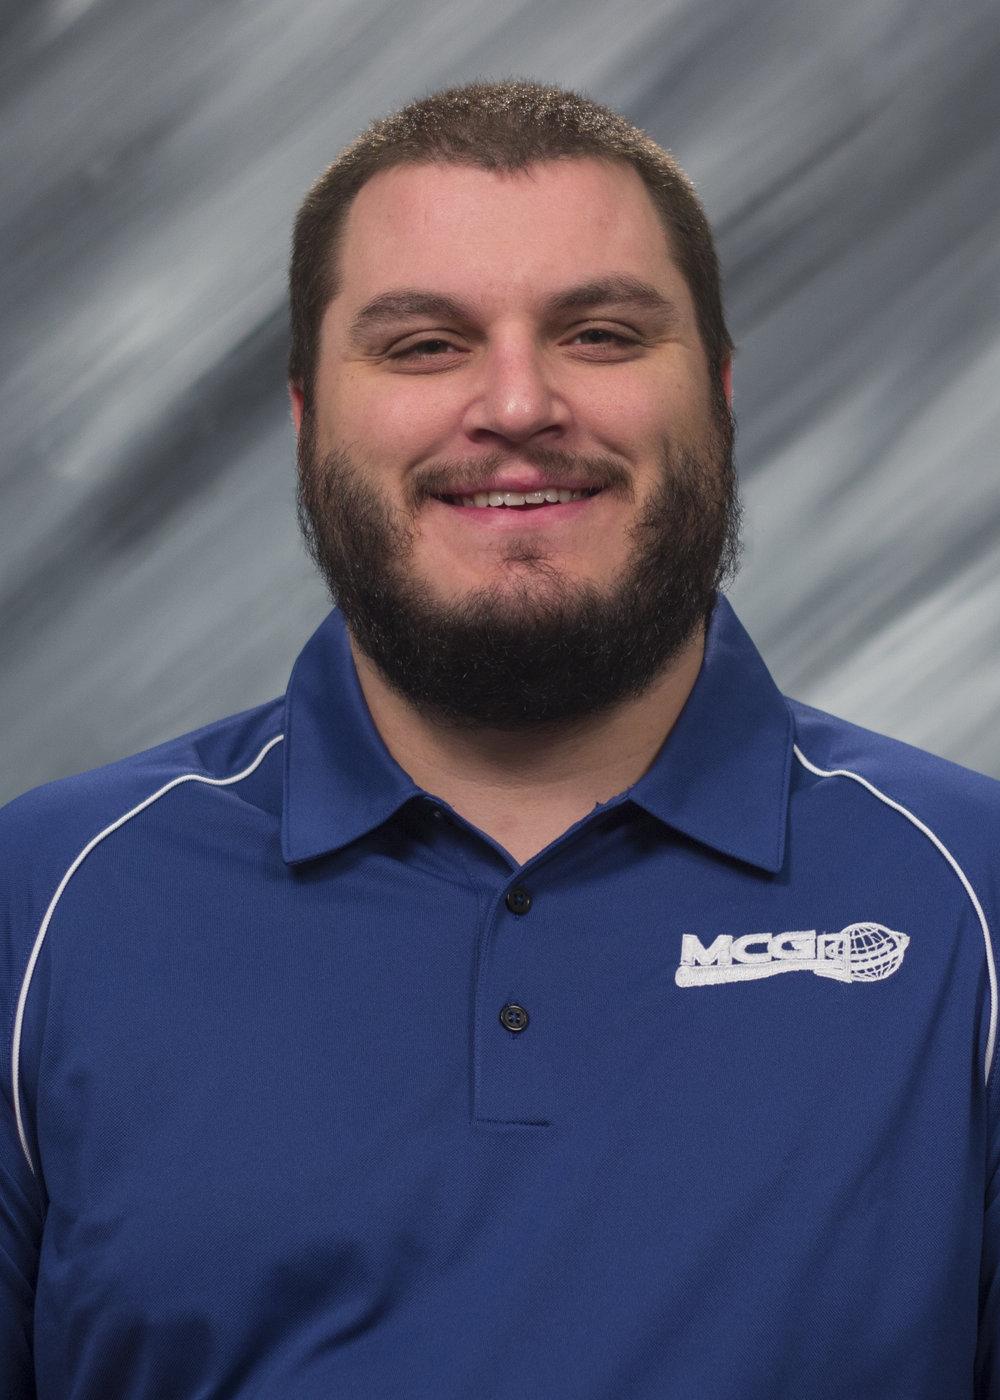 Kyle Mitterer, Service Technician